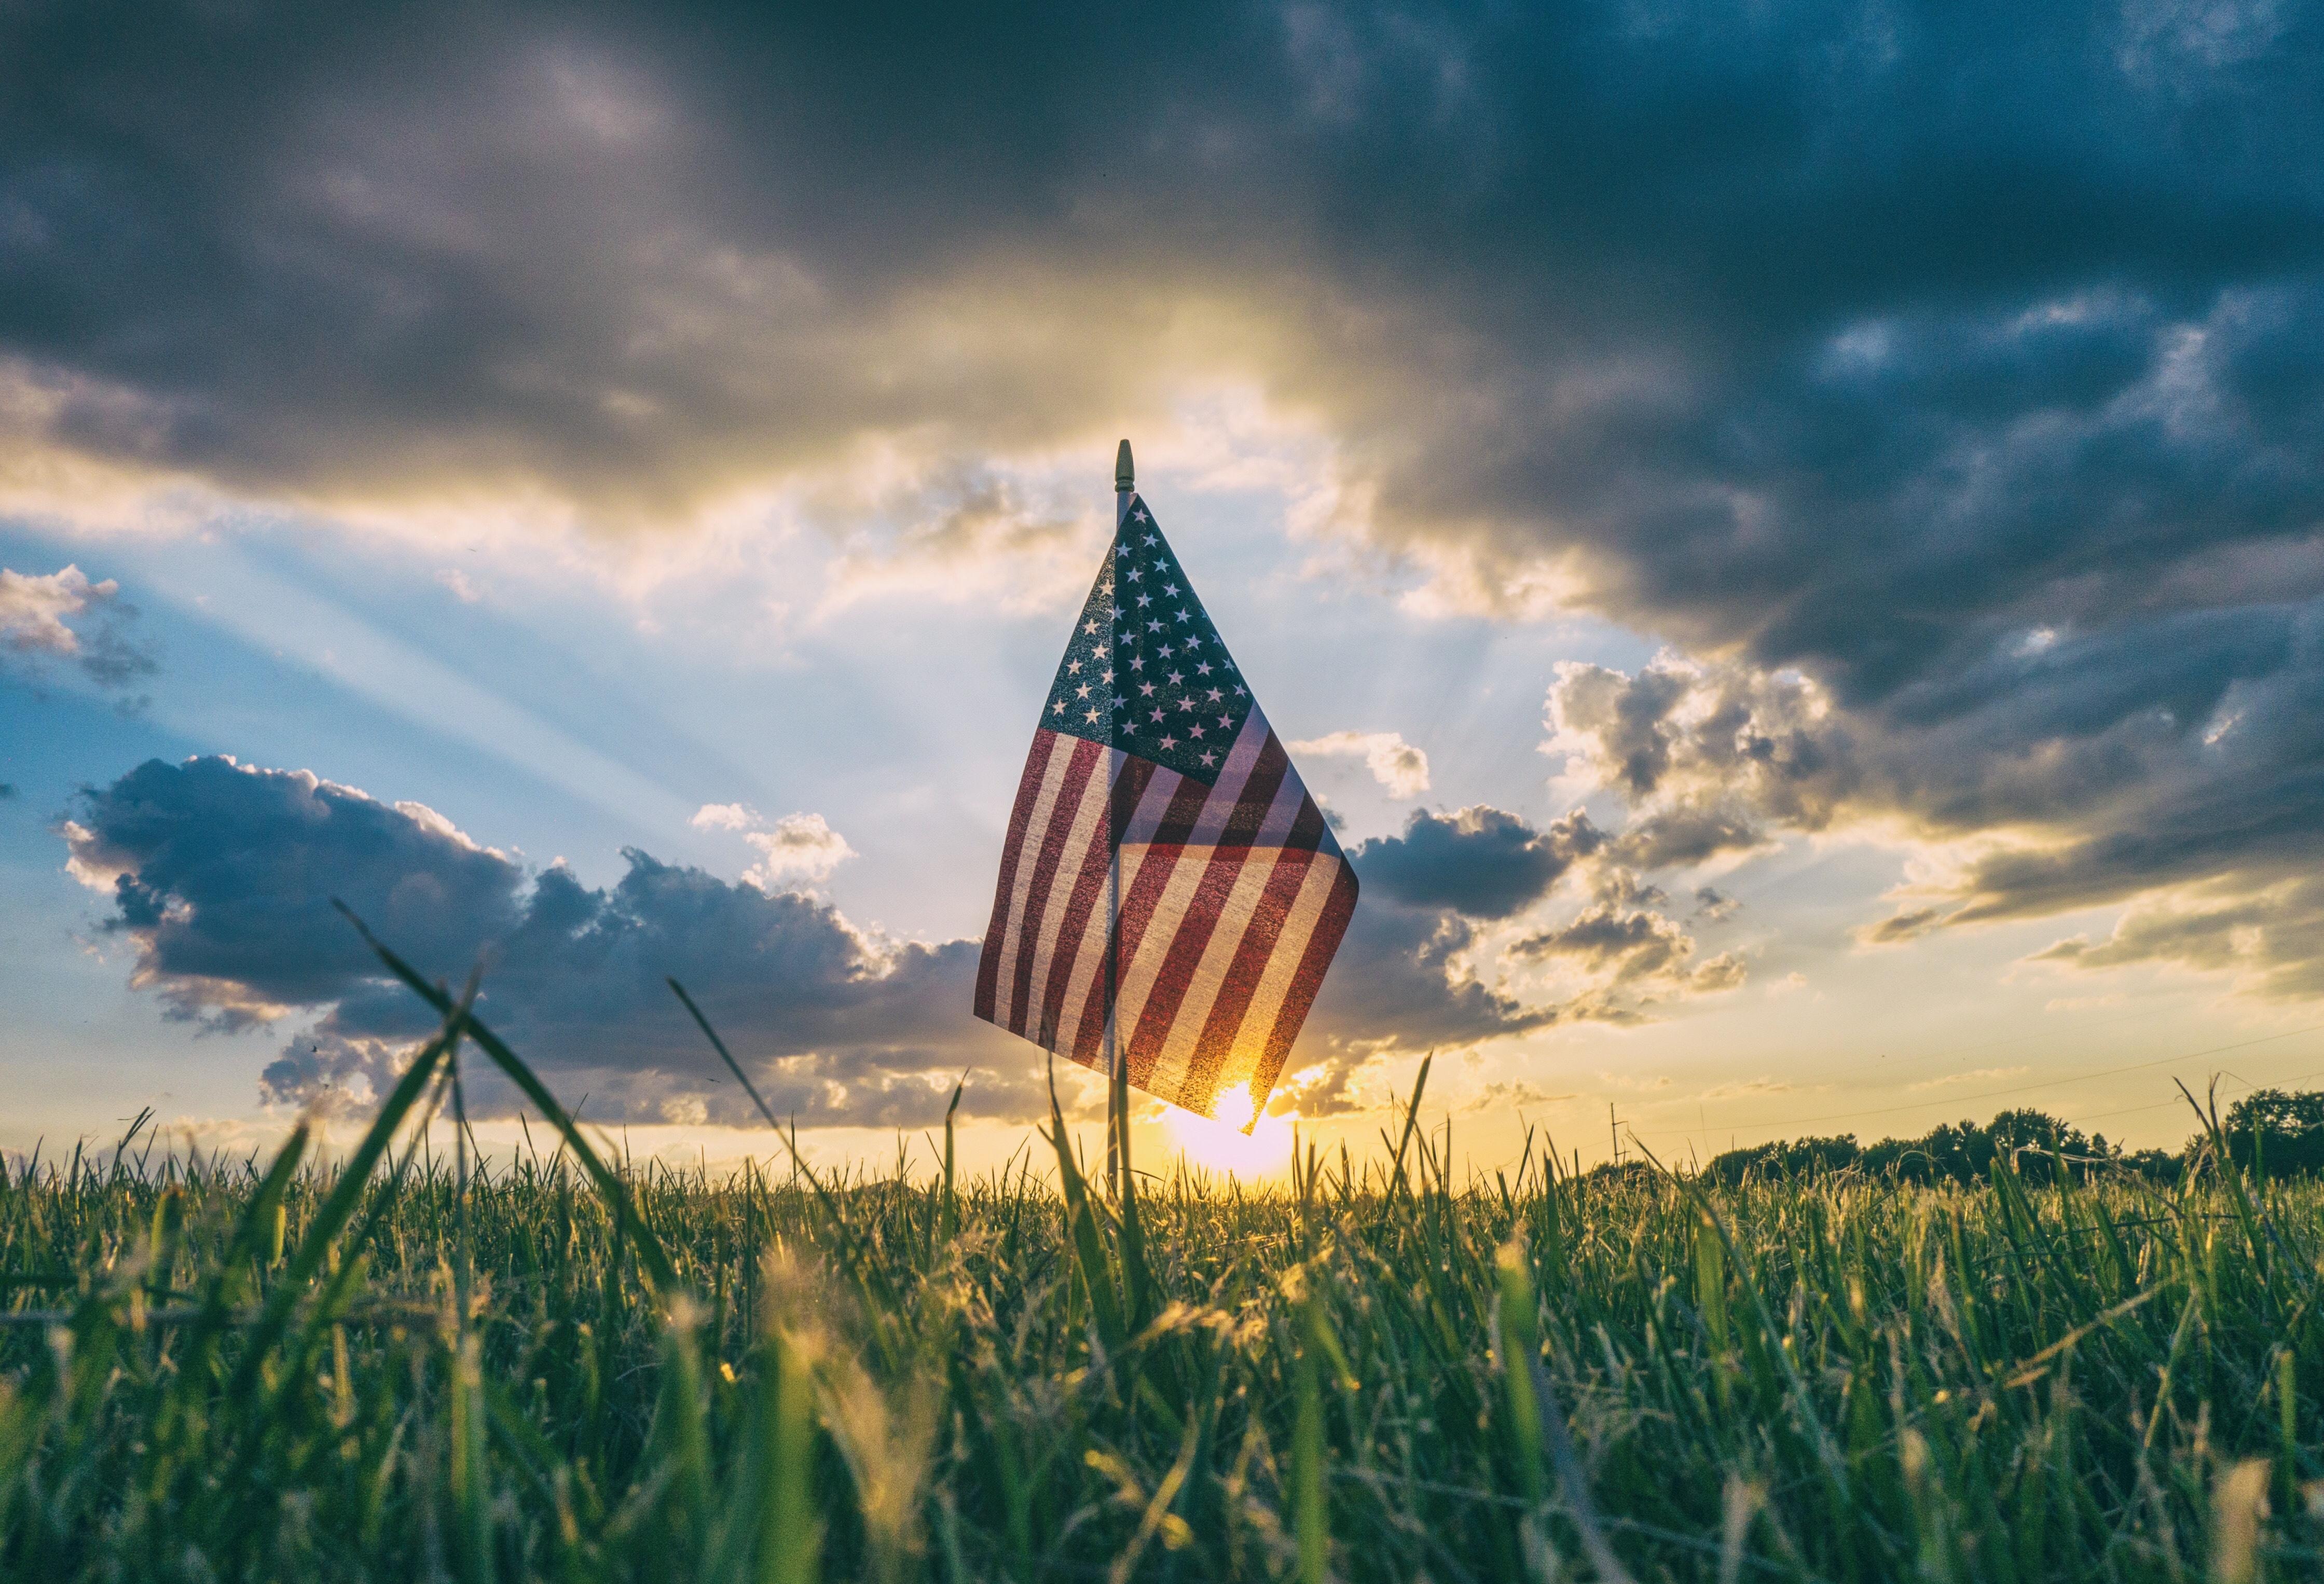 Real Veterans on Veteran's Day